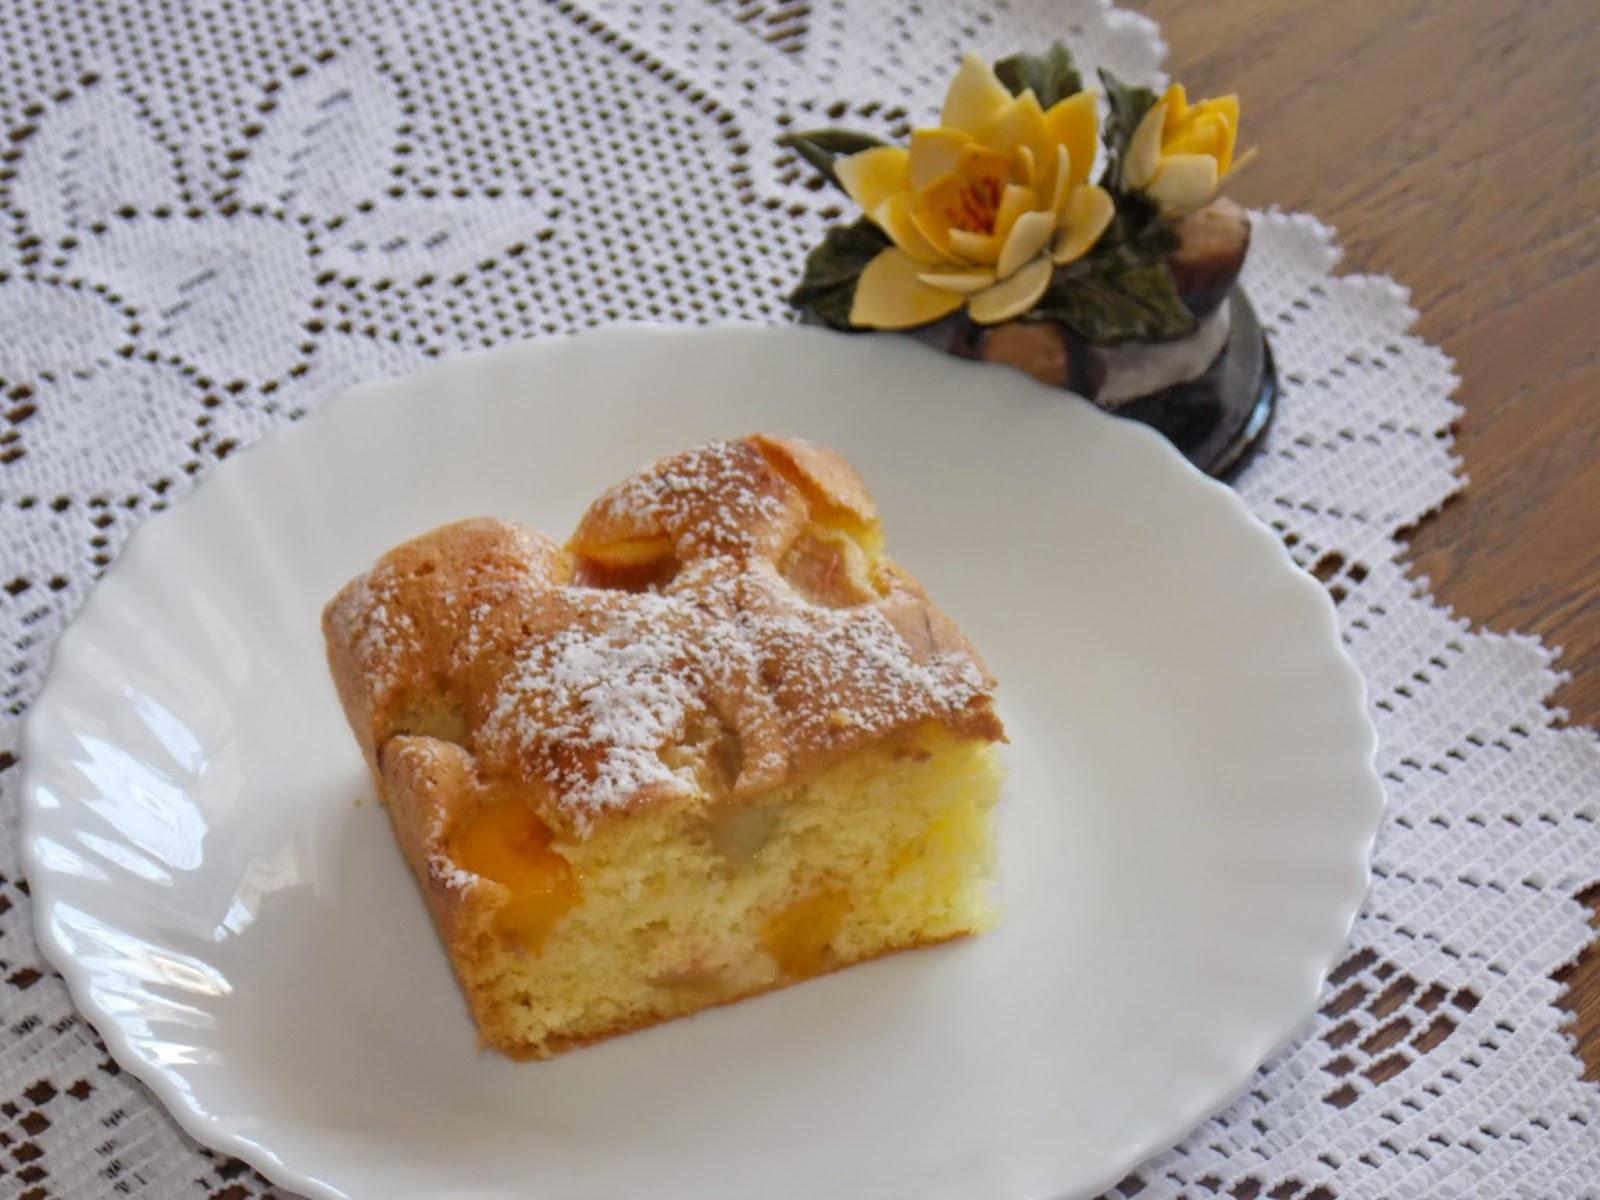 Delikatne ciasto rabarbarowo-brzoskwiniowe